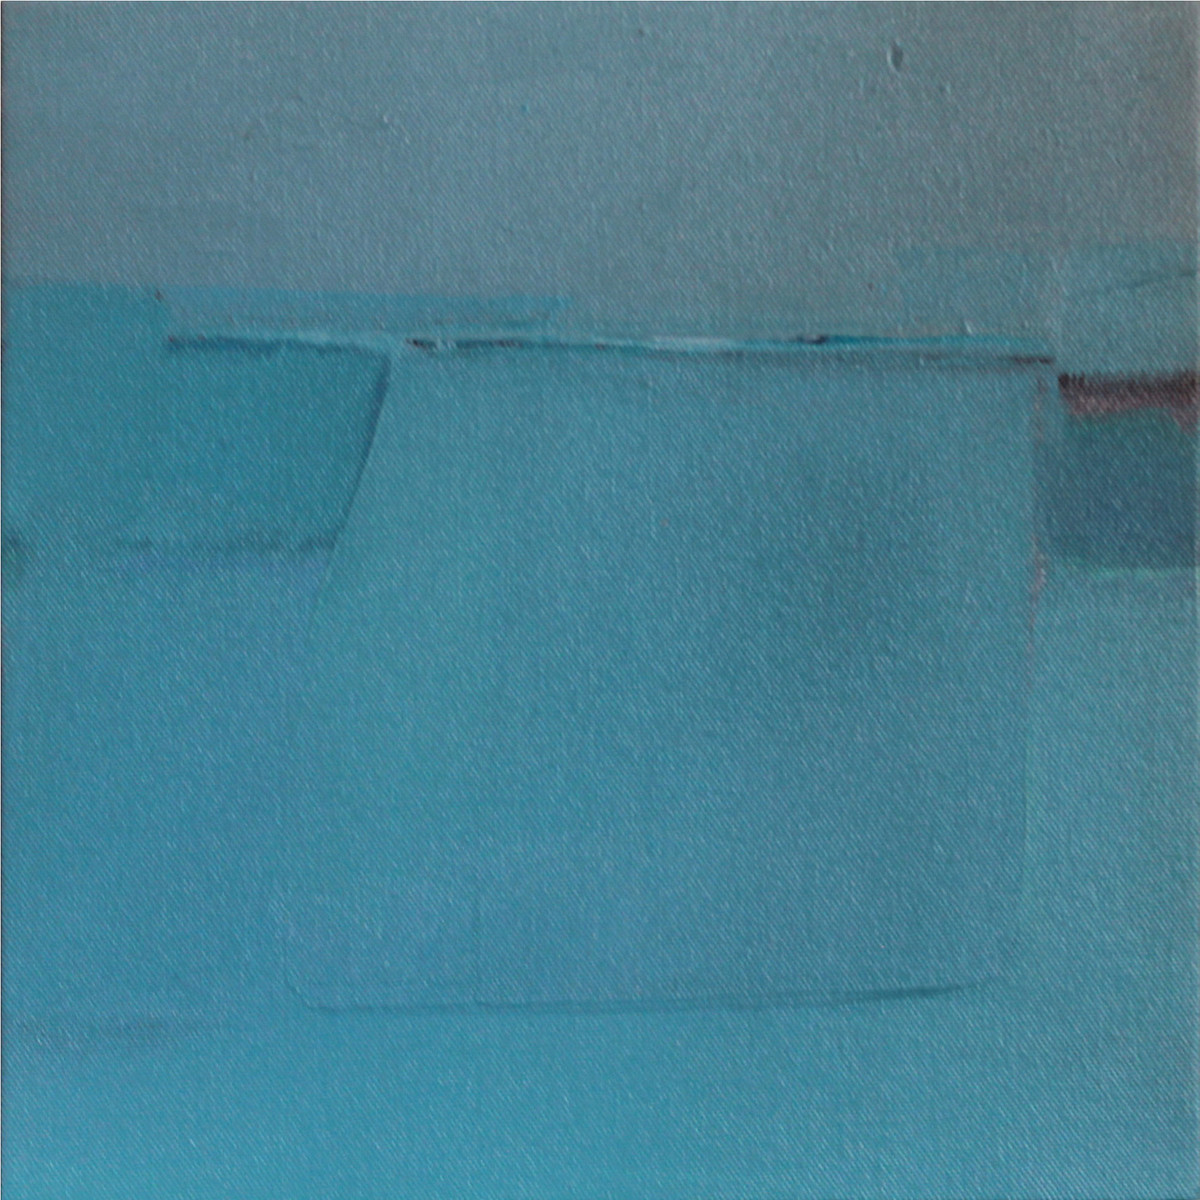 BLUE C5 by Deepak Madhukar Sonar, Abstract Painting, Acrylic on Canvas, Cyan color